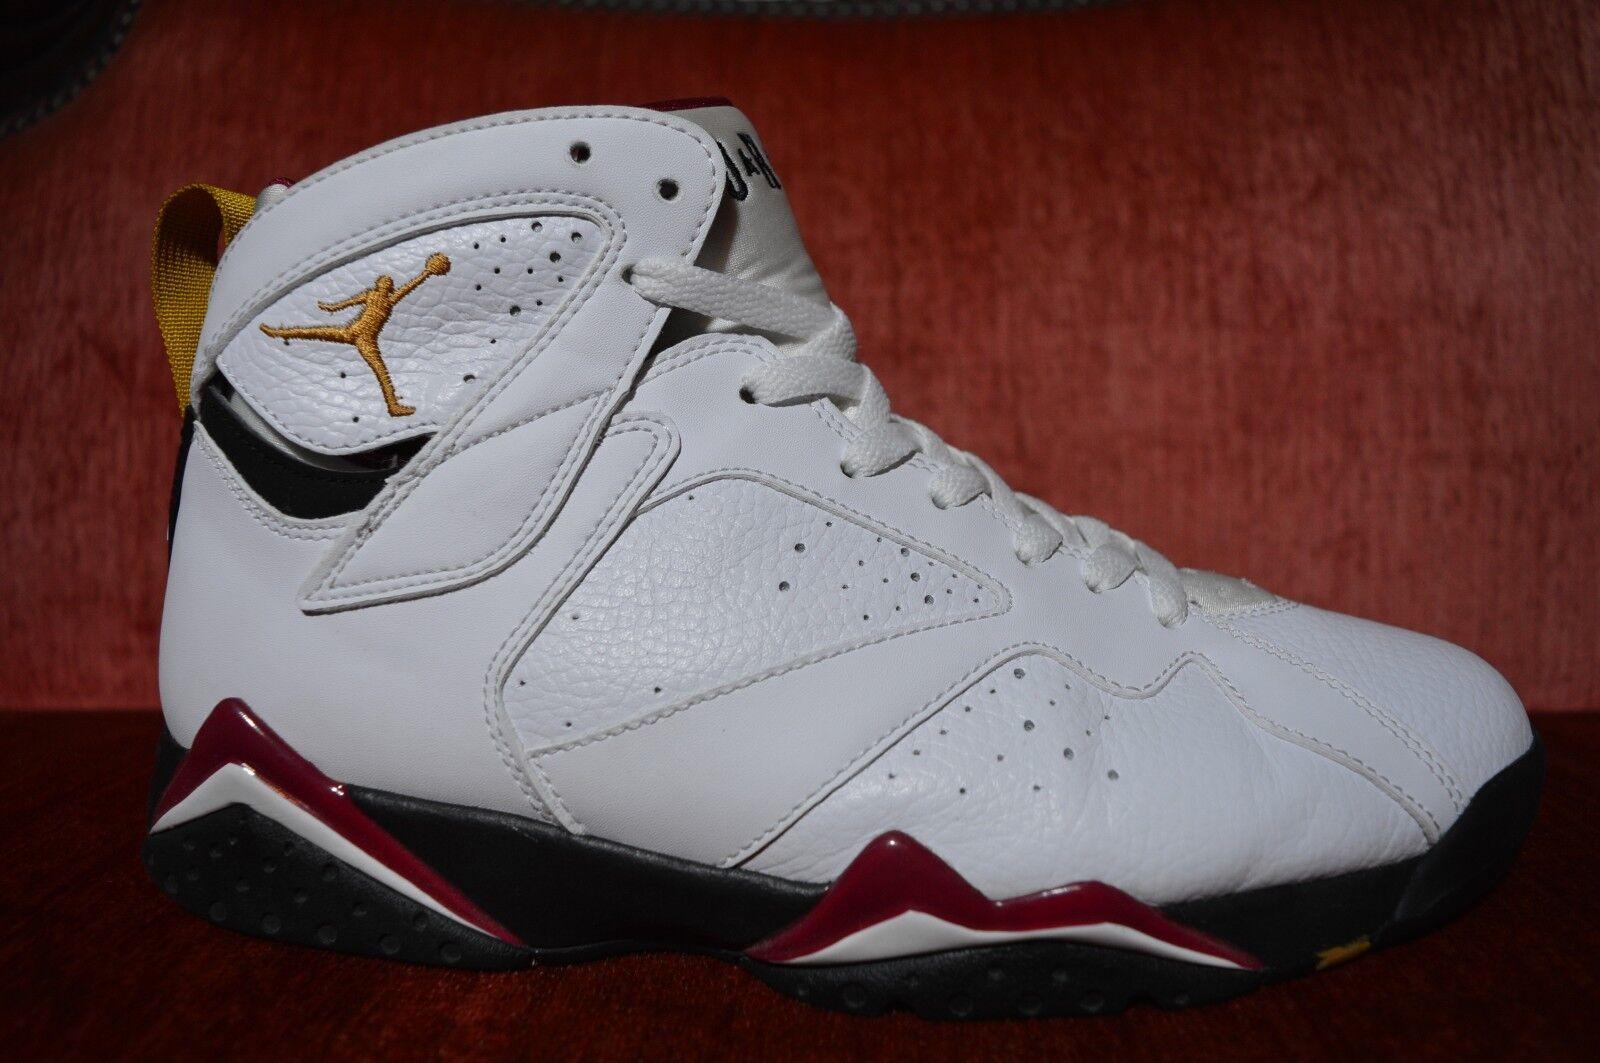 WORN 2X Nike Air Jordan White Black Cardinal Vll 7 Retro Size 10 304775-104 Red